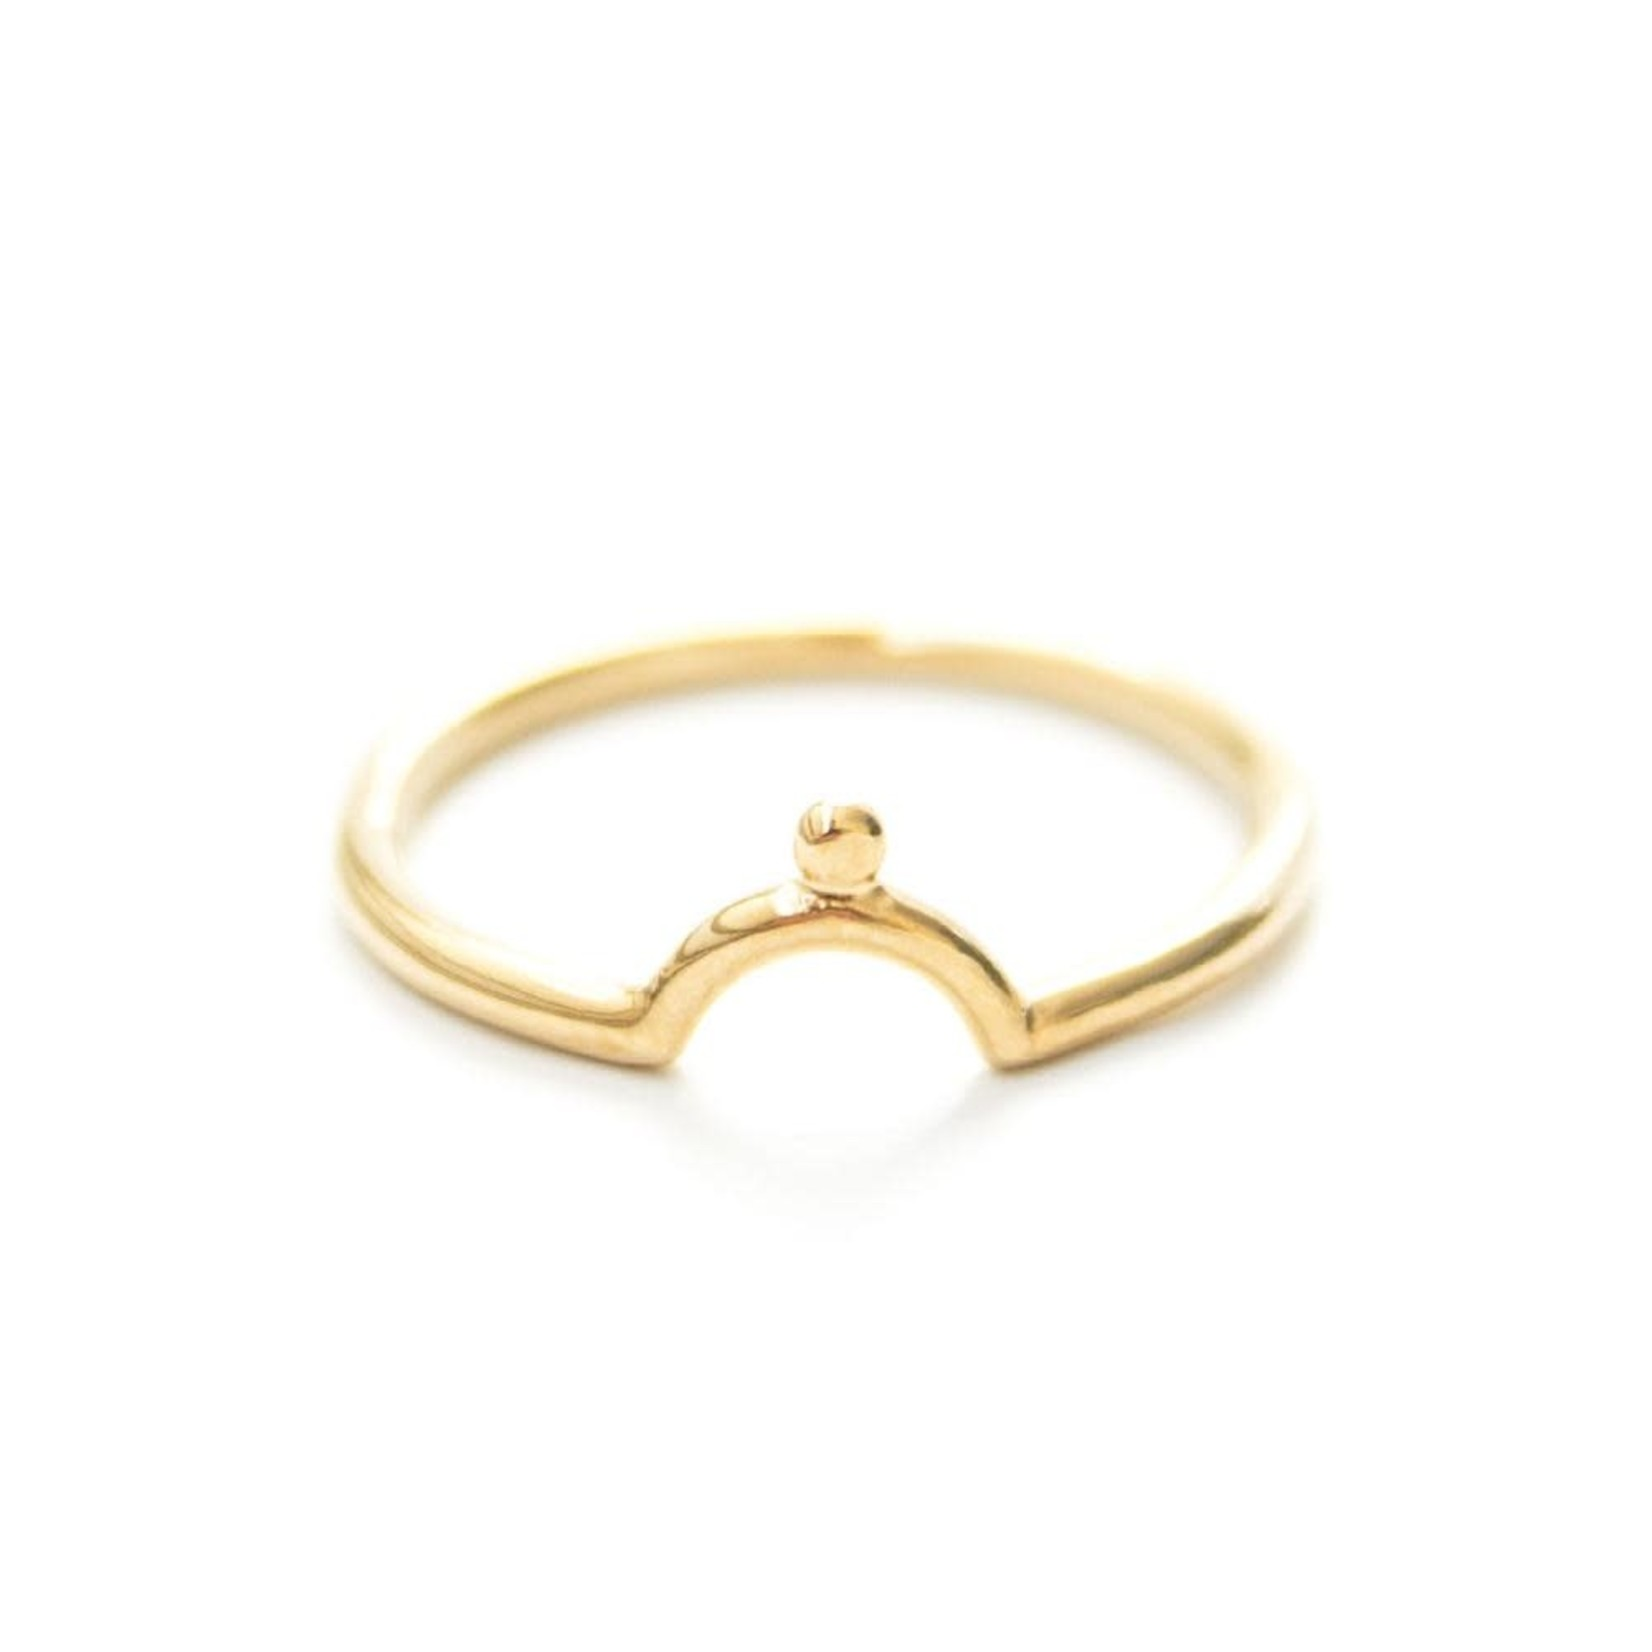 Welldunn jewelry Welldunn OMEGA or